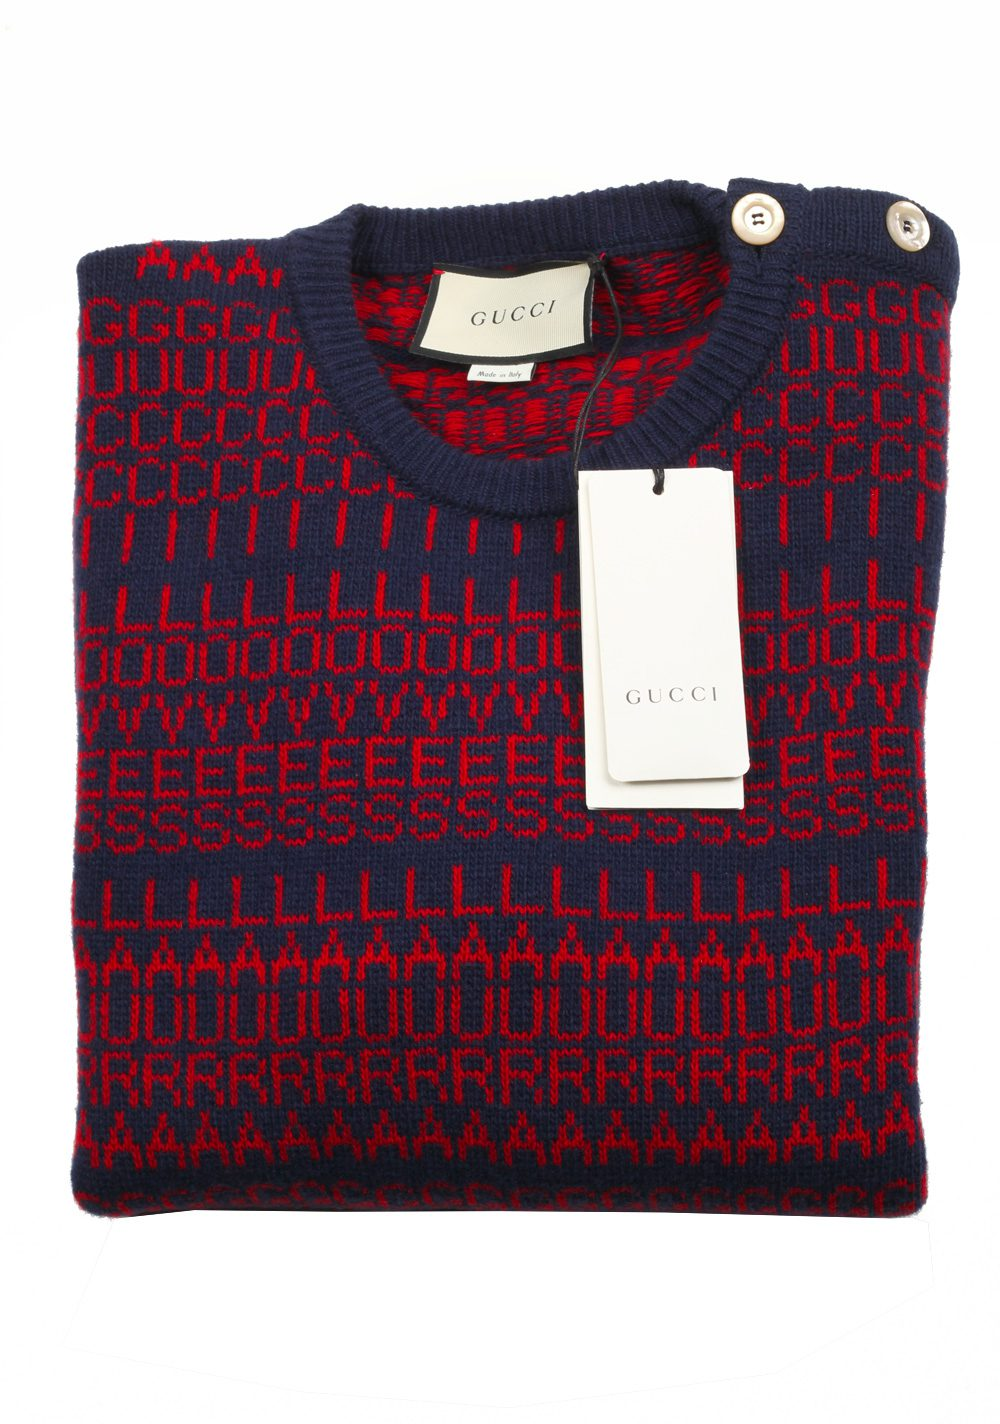 Gucci Blue Crew Neck Gucci Loves Laura Sweater Shirt Size XL / 40R U.S. | Costume Limité